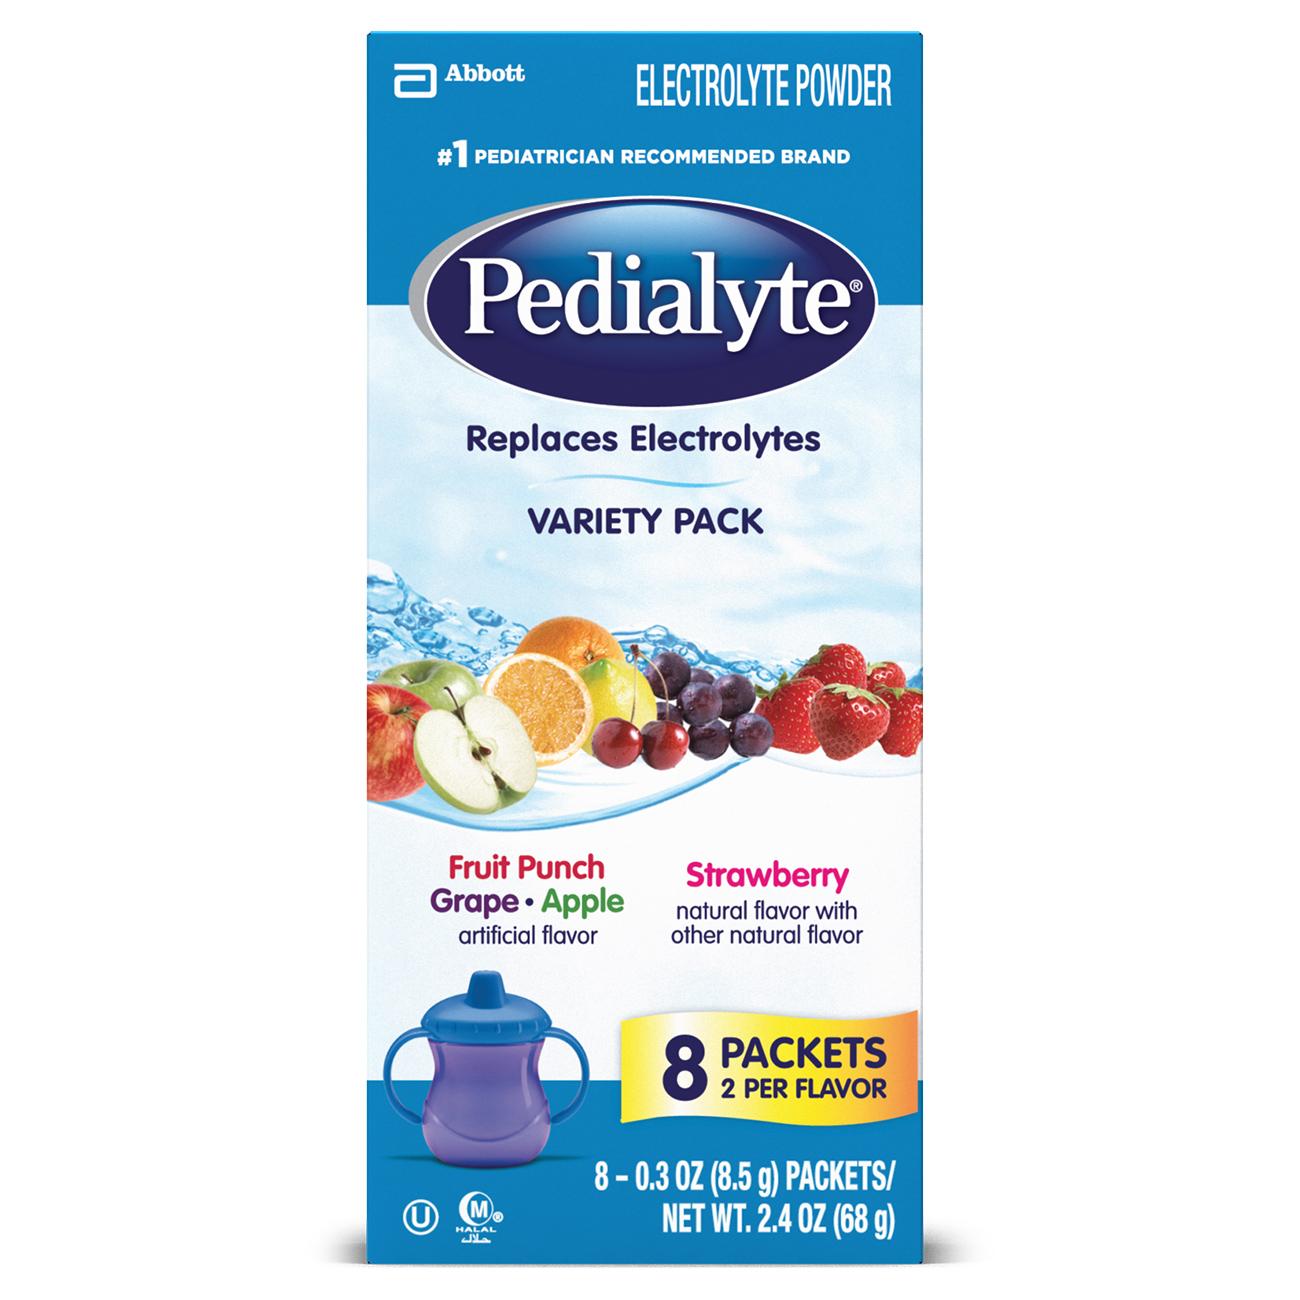 Pedialyte Electrolyte Powder, Electrolyte Drink, Variety ...